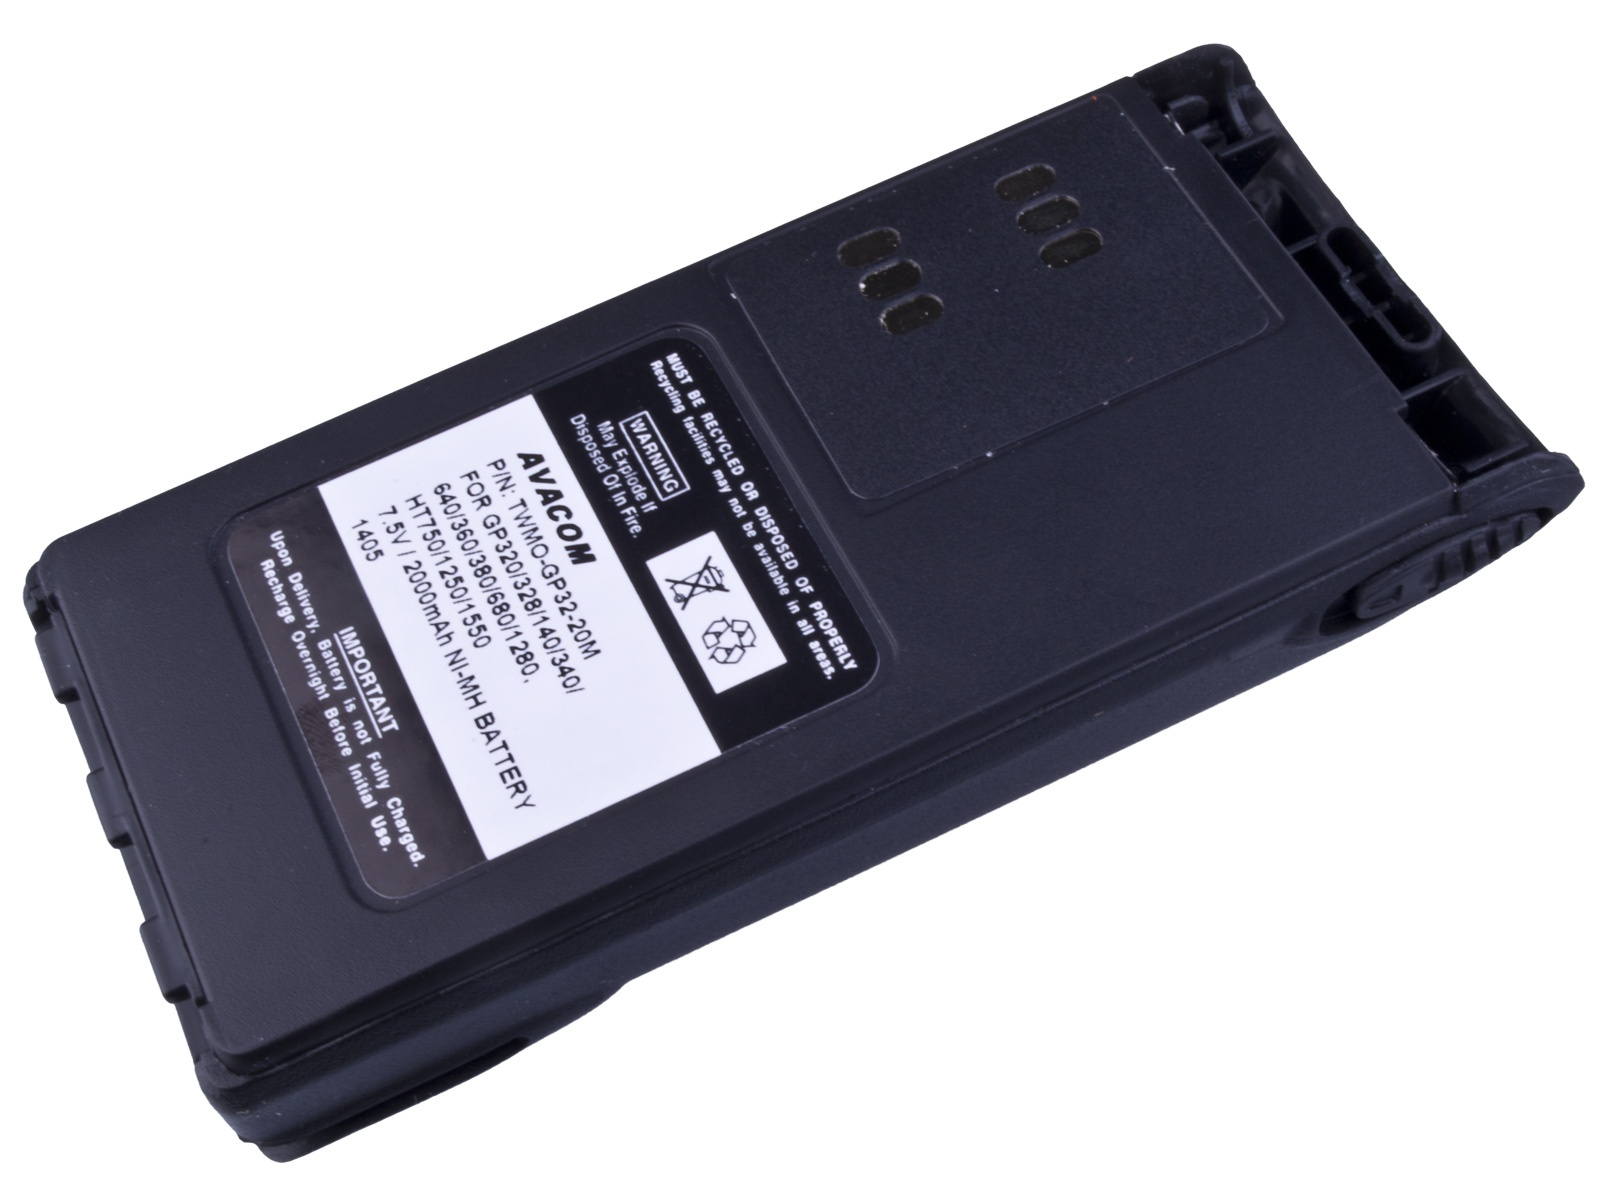 AVACOM baterie pro radiostanice Motorola GP320/340/360, HT750/1250..- WARIS Ni-MH 7,5V 2000mAh